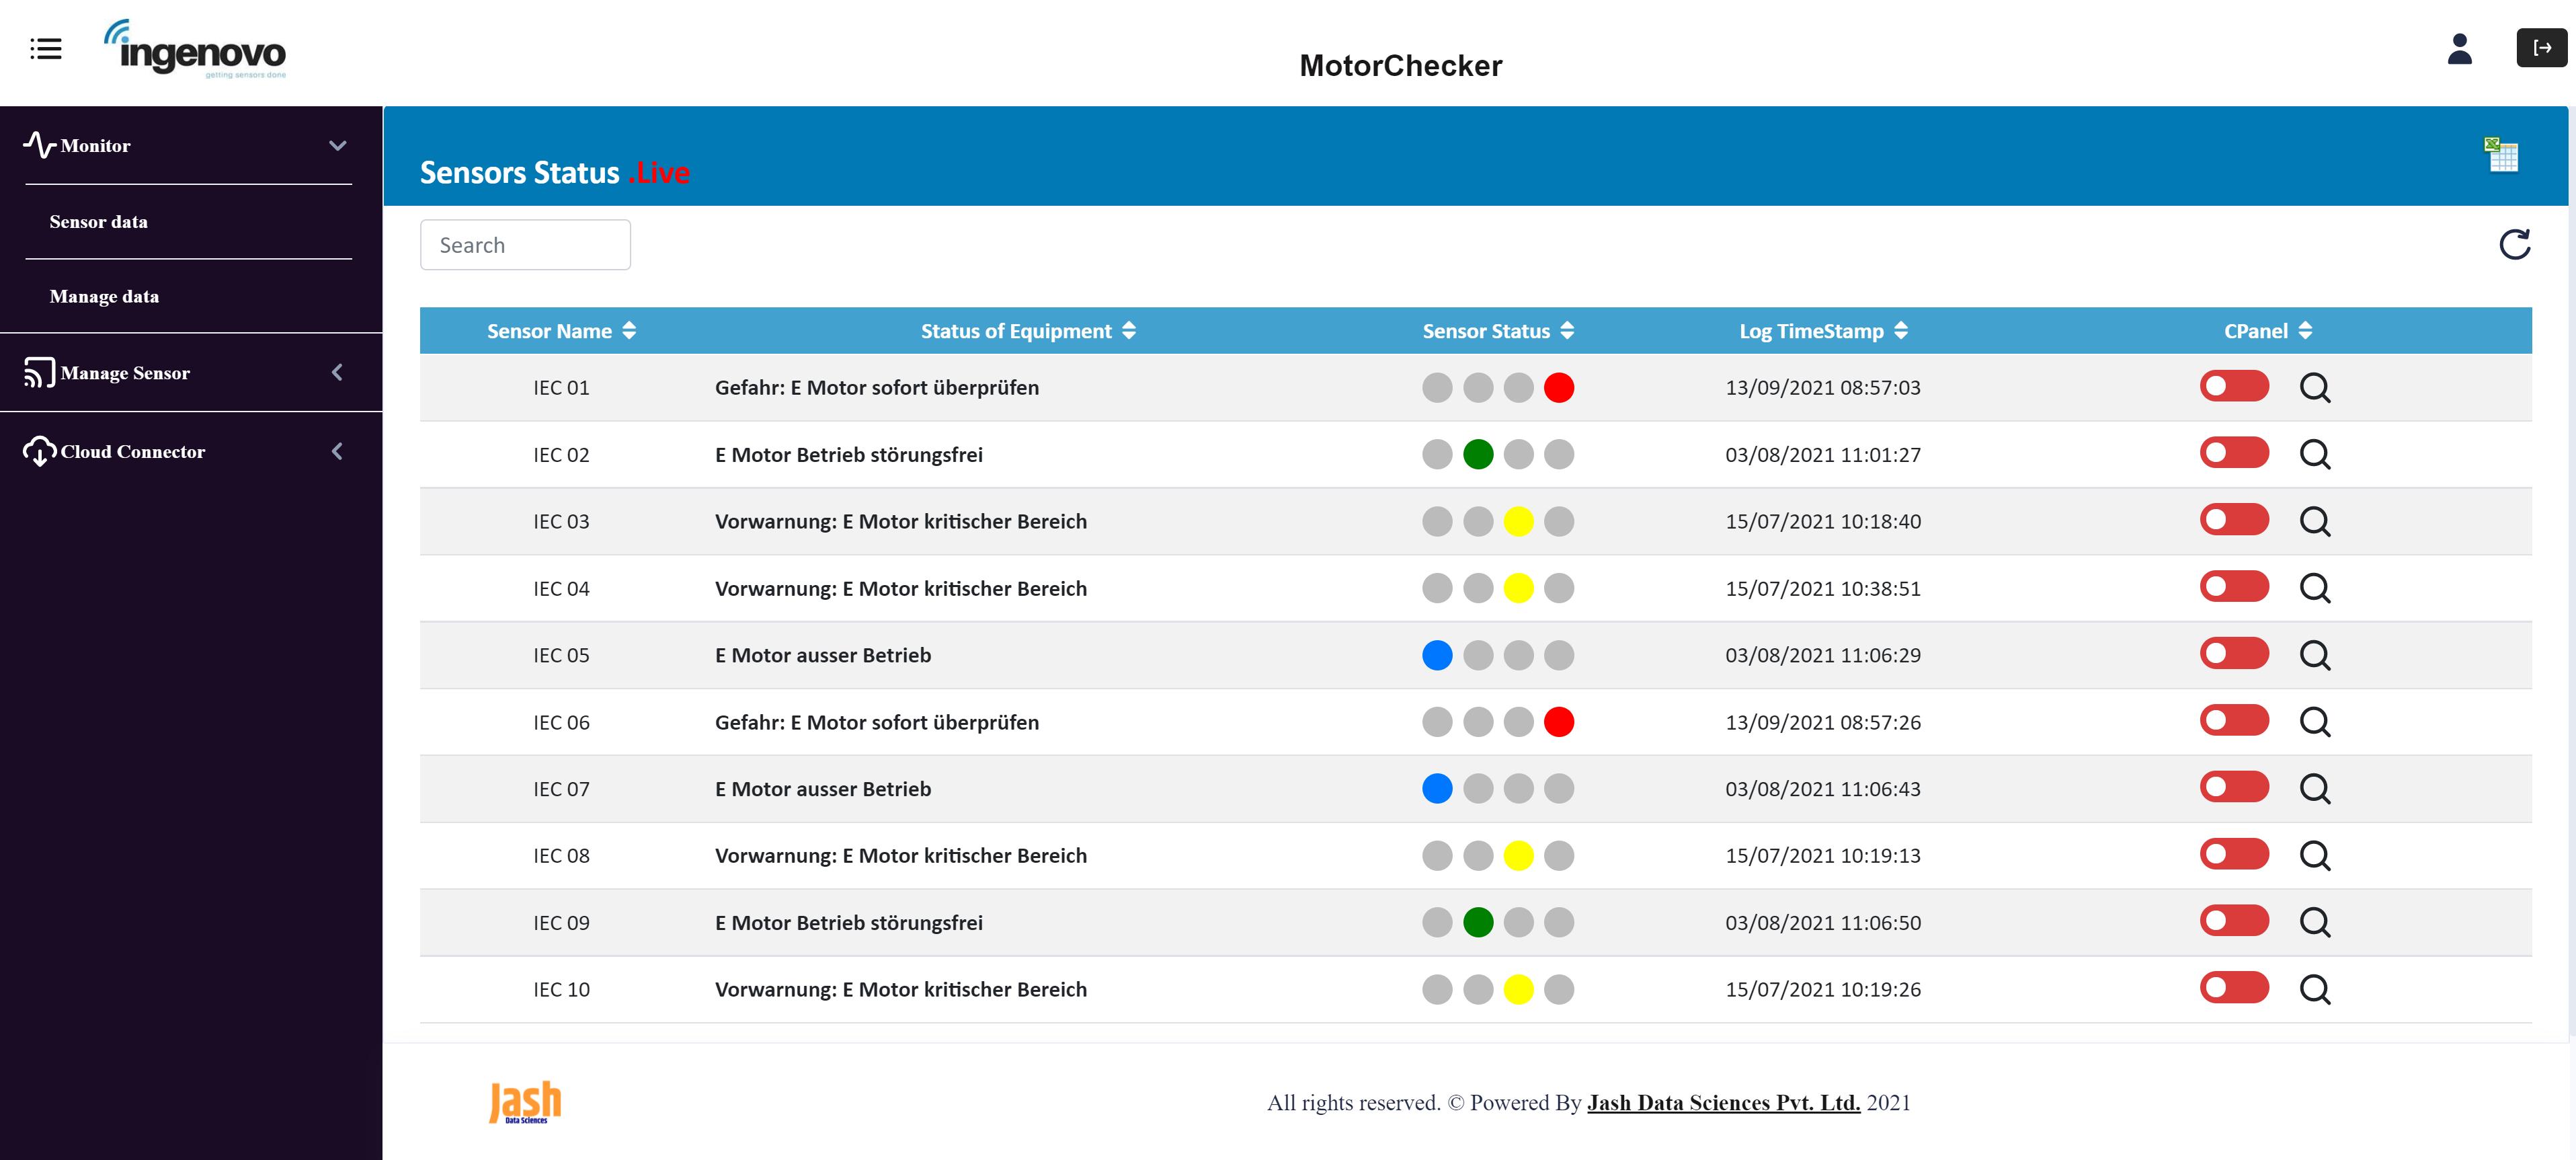 ingenovo Portal für Motor Checker